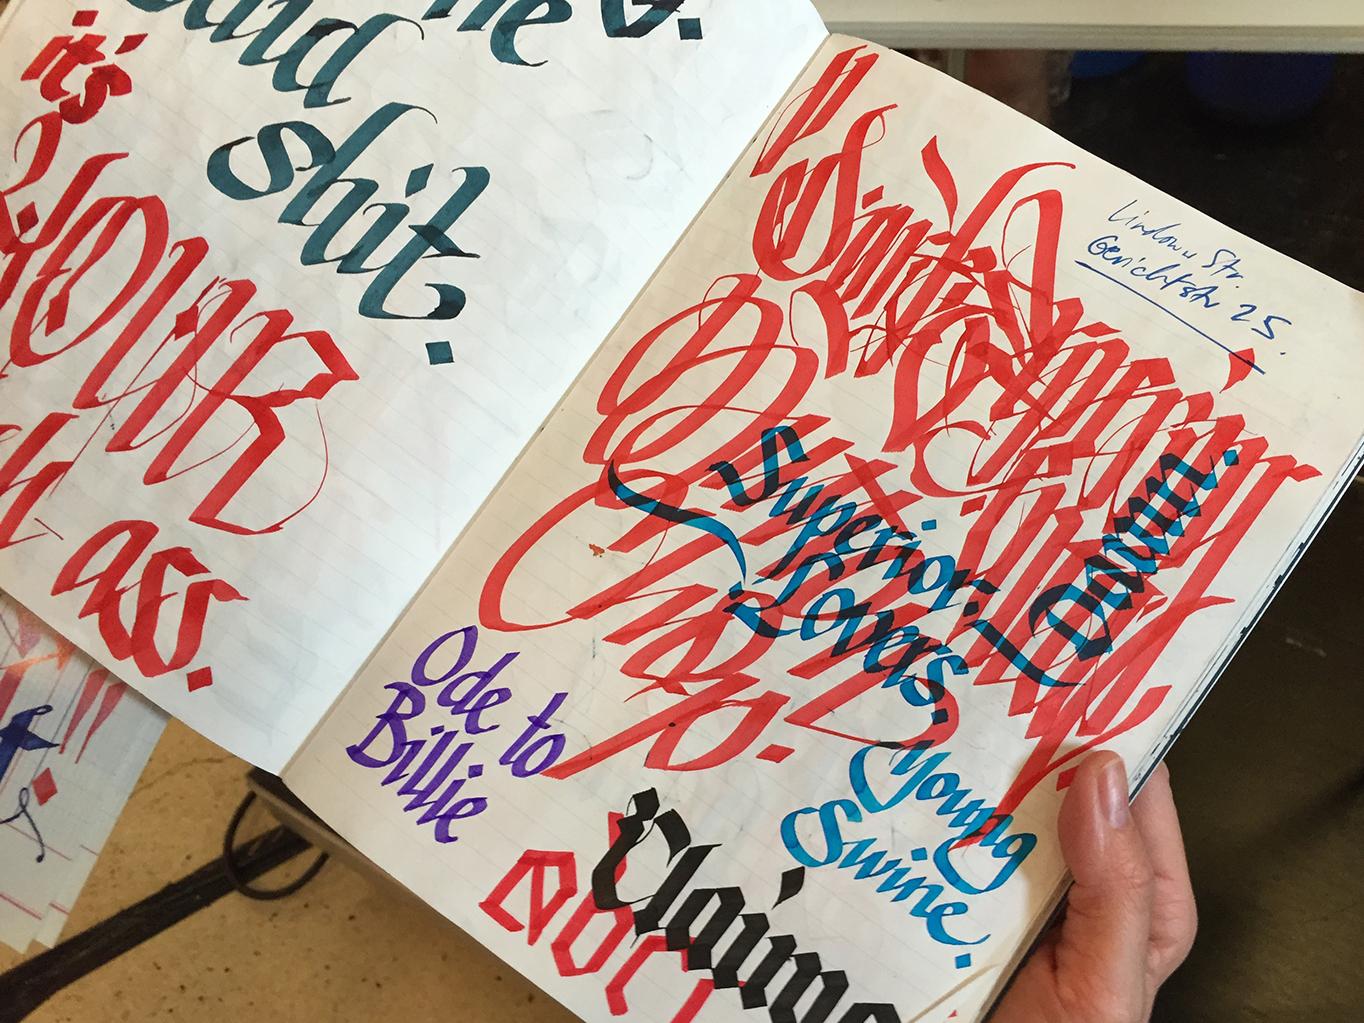 Flipping through the sketchbook of Drury Brennan